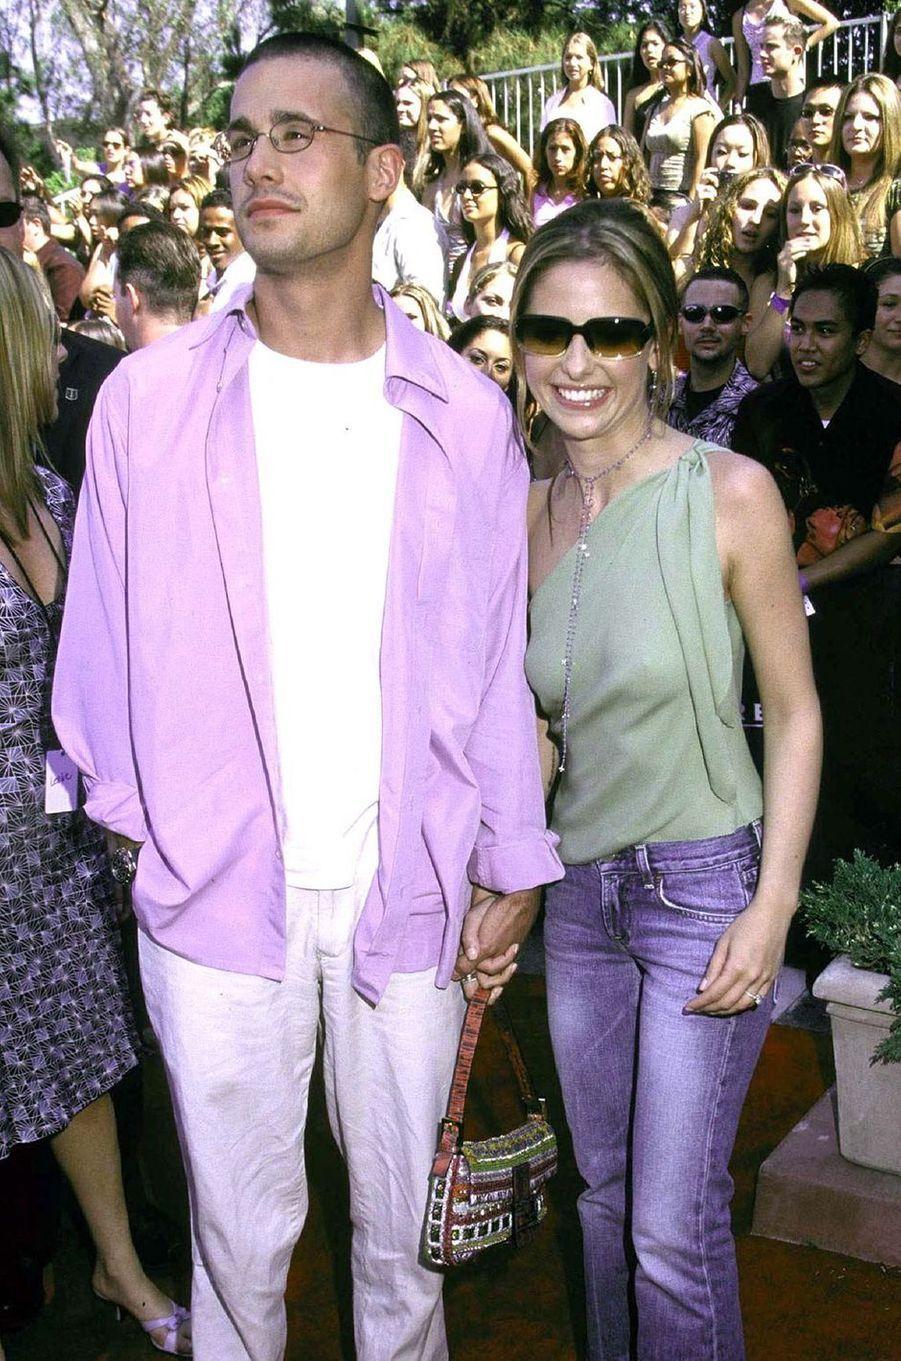 Freddie Prinze Jr. et Sarah Michelle Gellar aux Teen Choice Awards à Los Angeles en août 2001